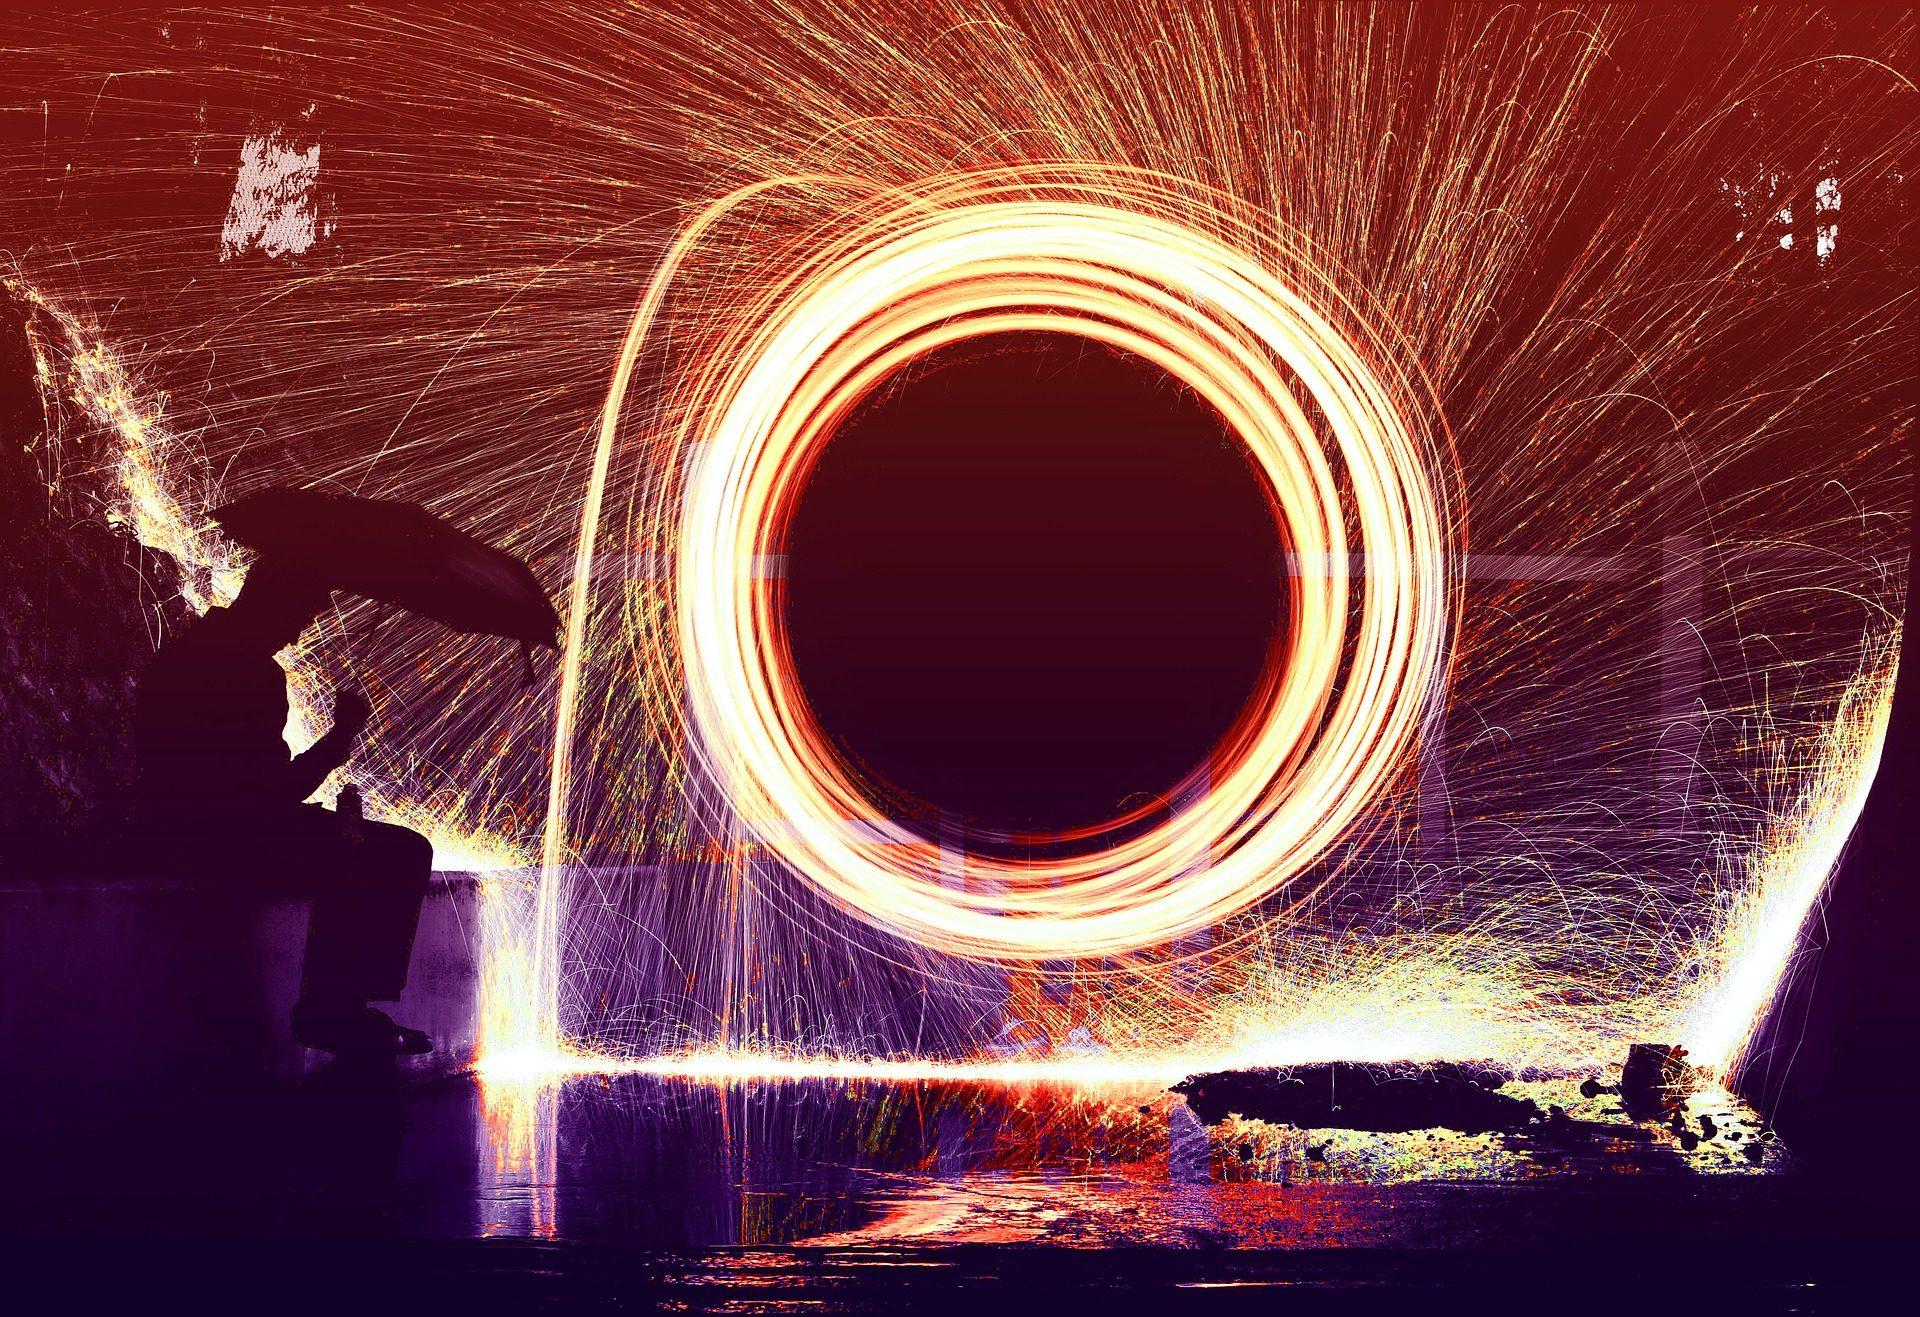 Spirale, Feuer, Sparks, Rad, Mann, Regenschirm, Nacht - Wallpaper HD - Prof.-falken.com